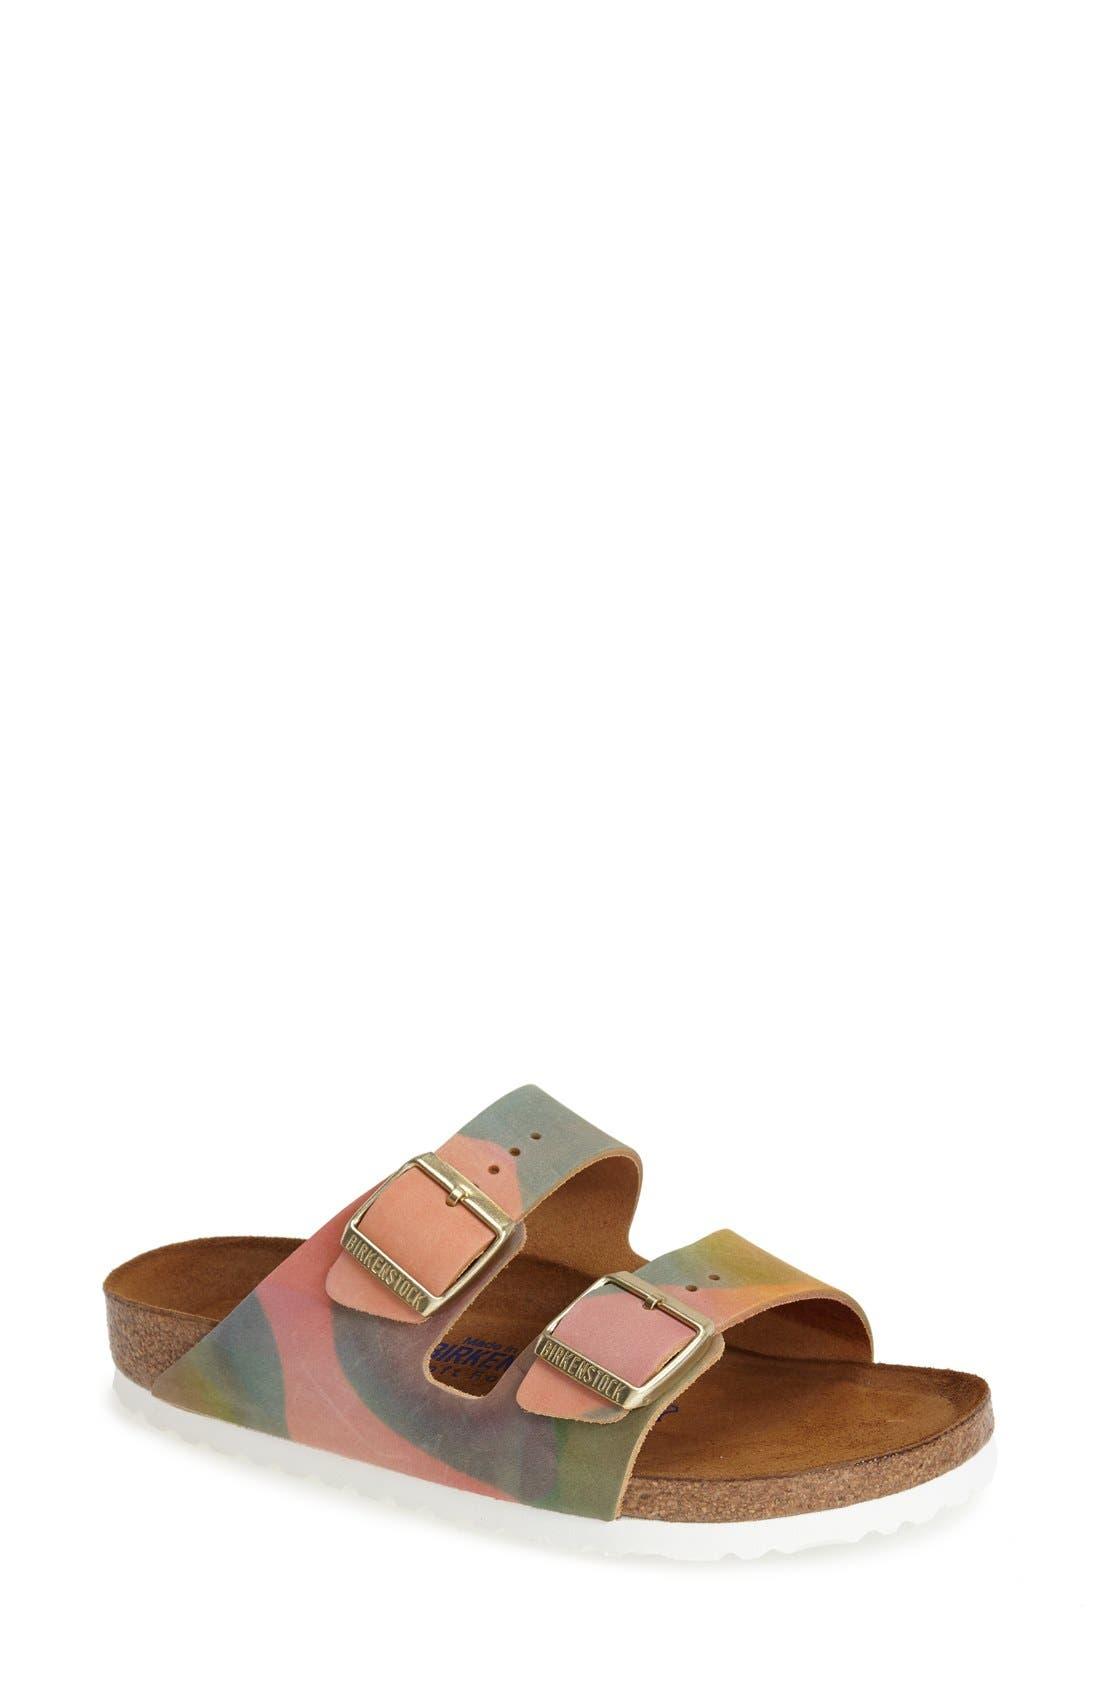 Alternate Image 1 Selected - Birkenstock 'Arizona' Nubuck Leather Sandal (Women)